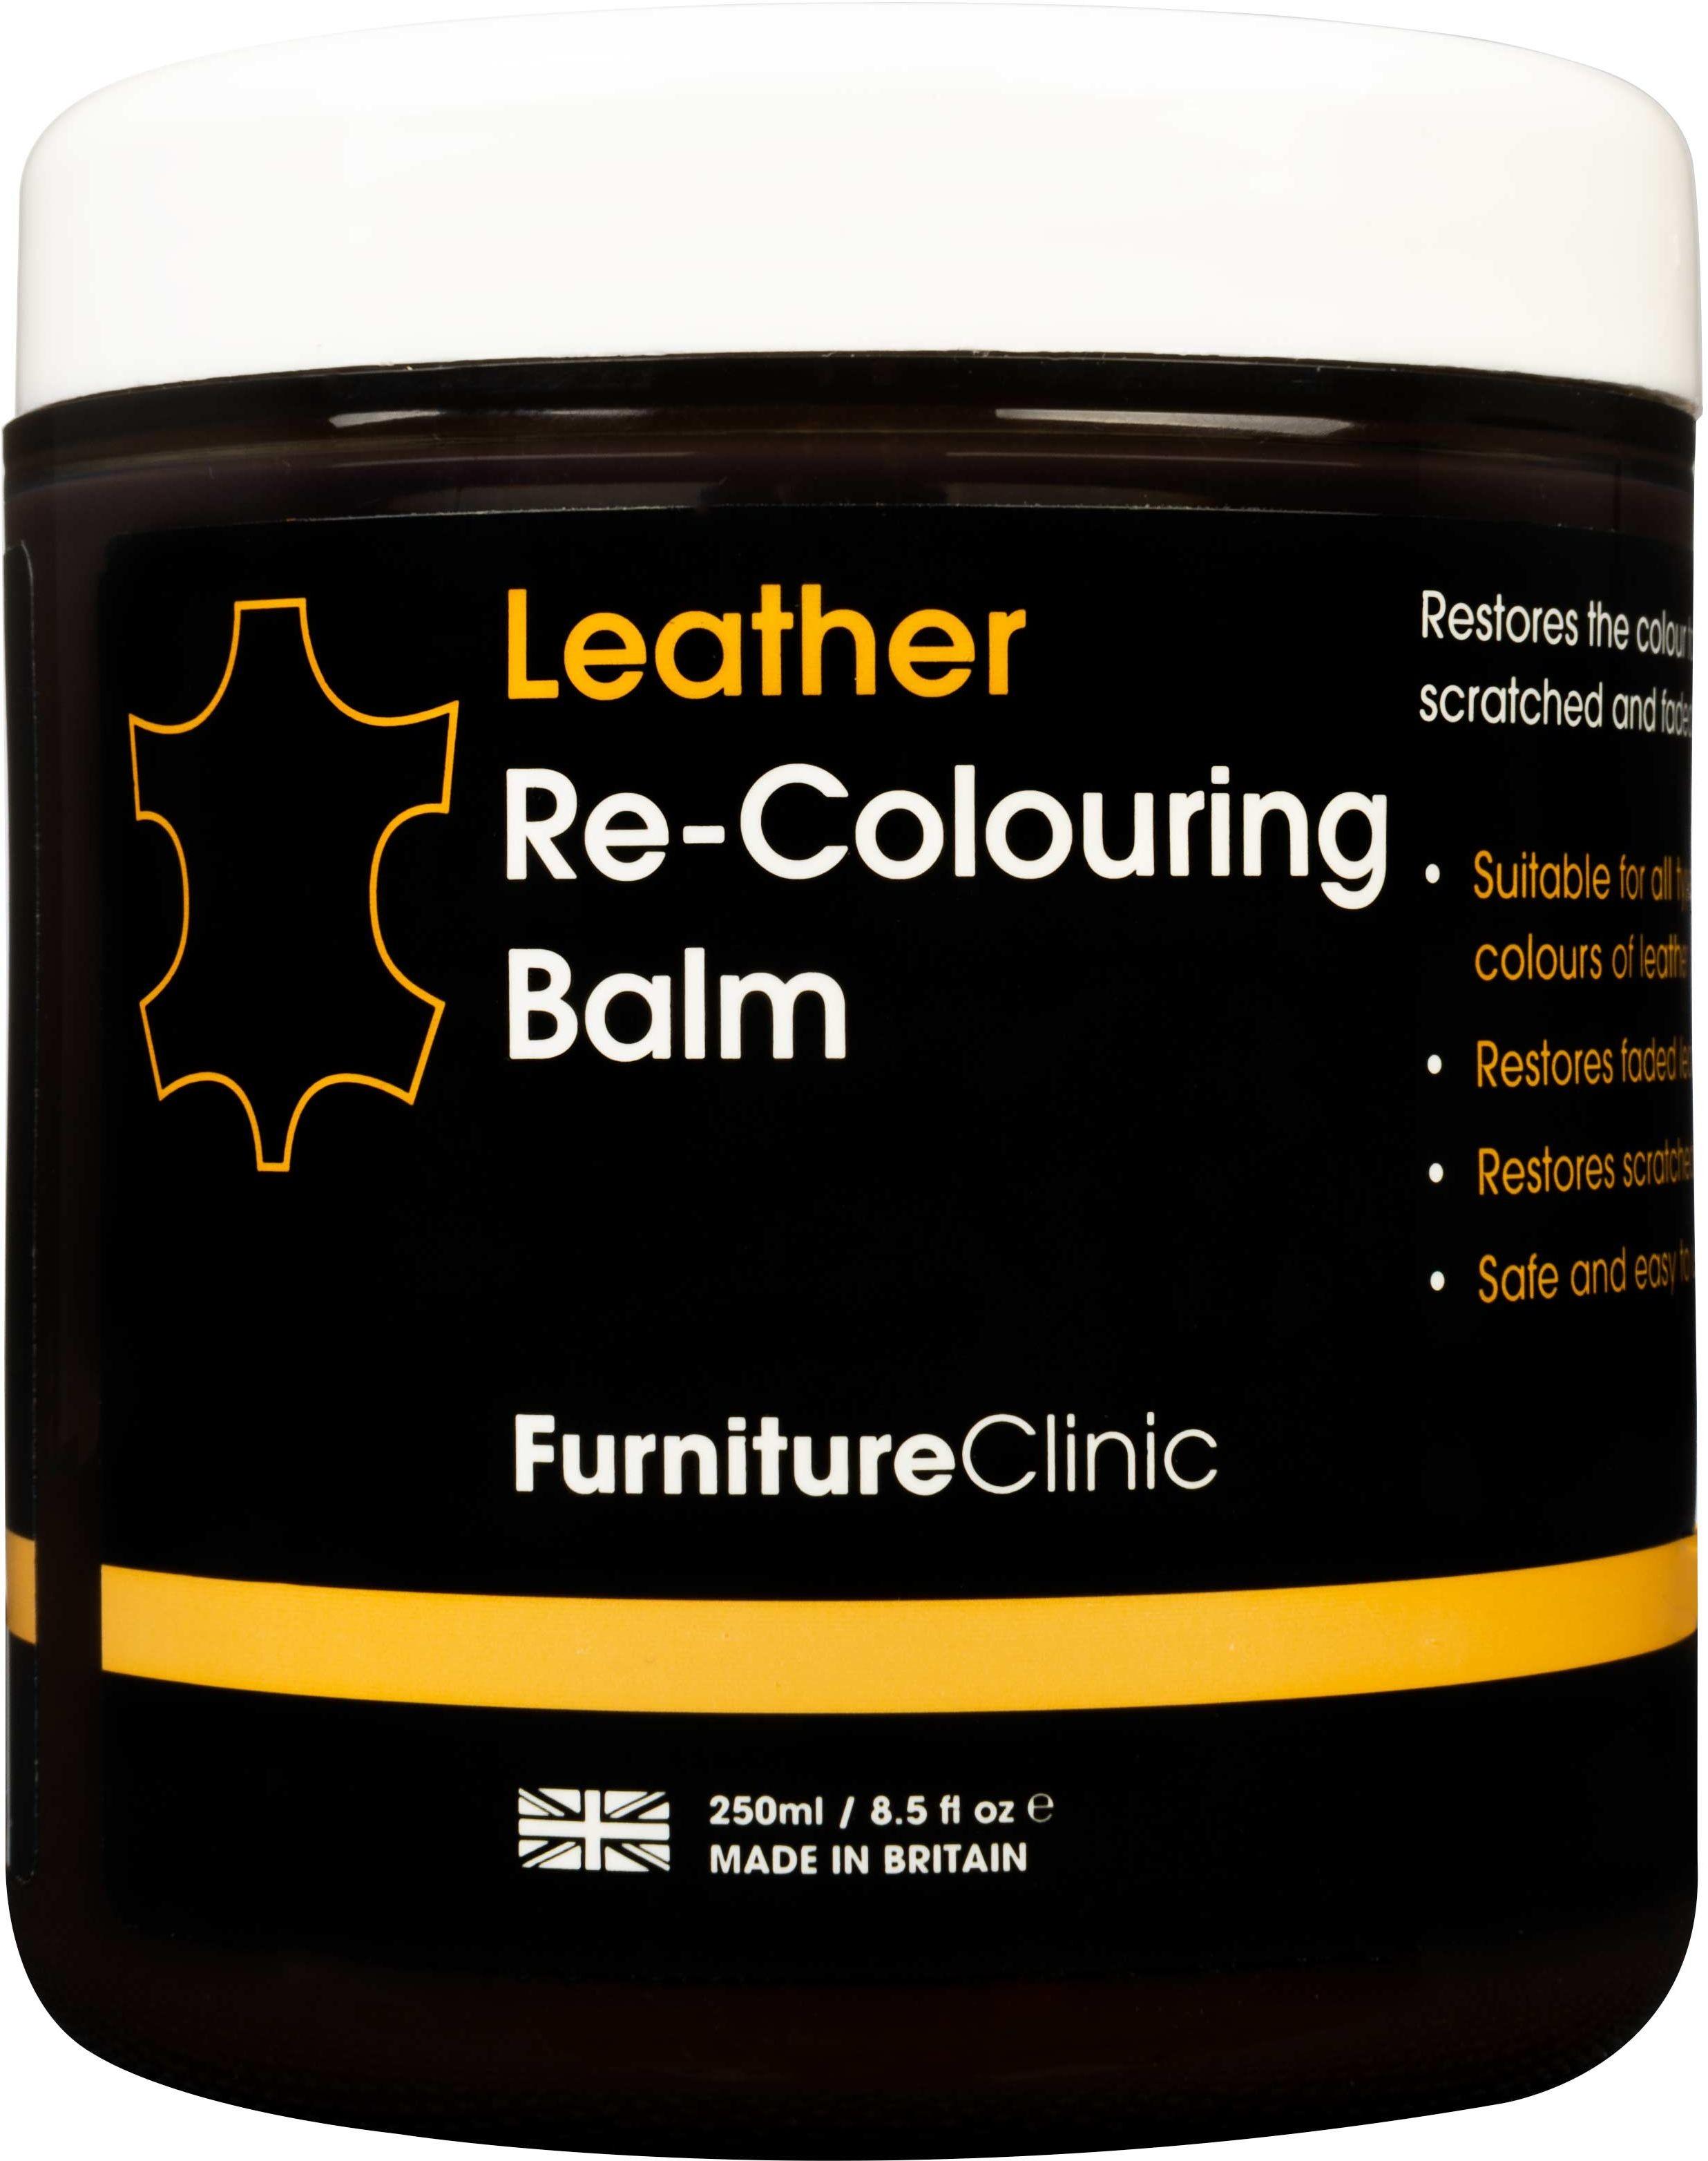 Furniture Clinic Leather Re-Colouring Balm balsam koloryzujący DARK BROWN 250ml FUR000010